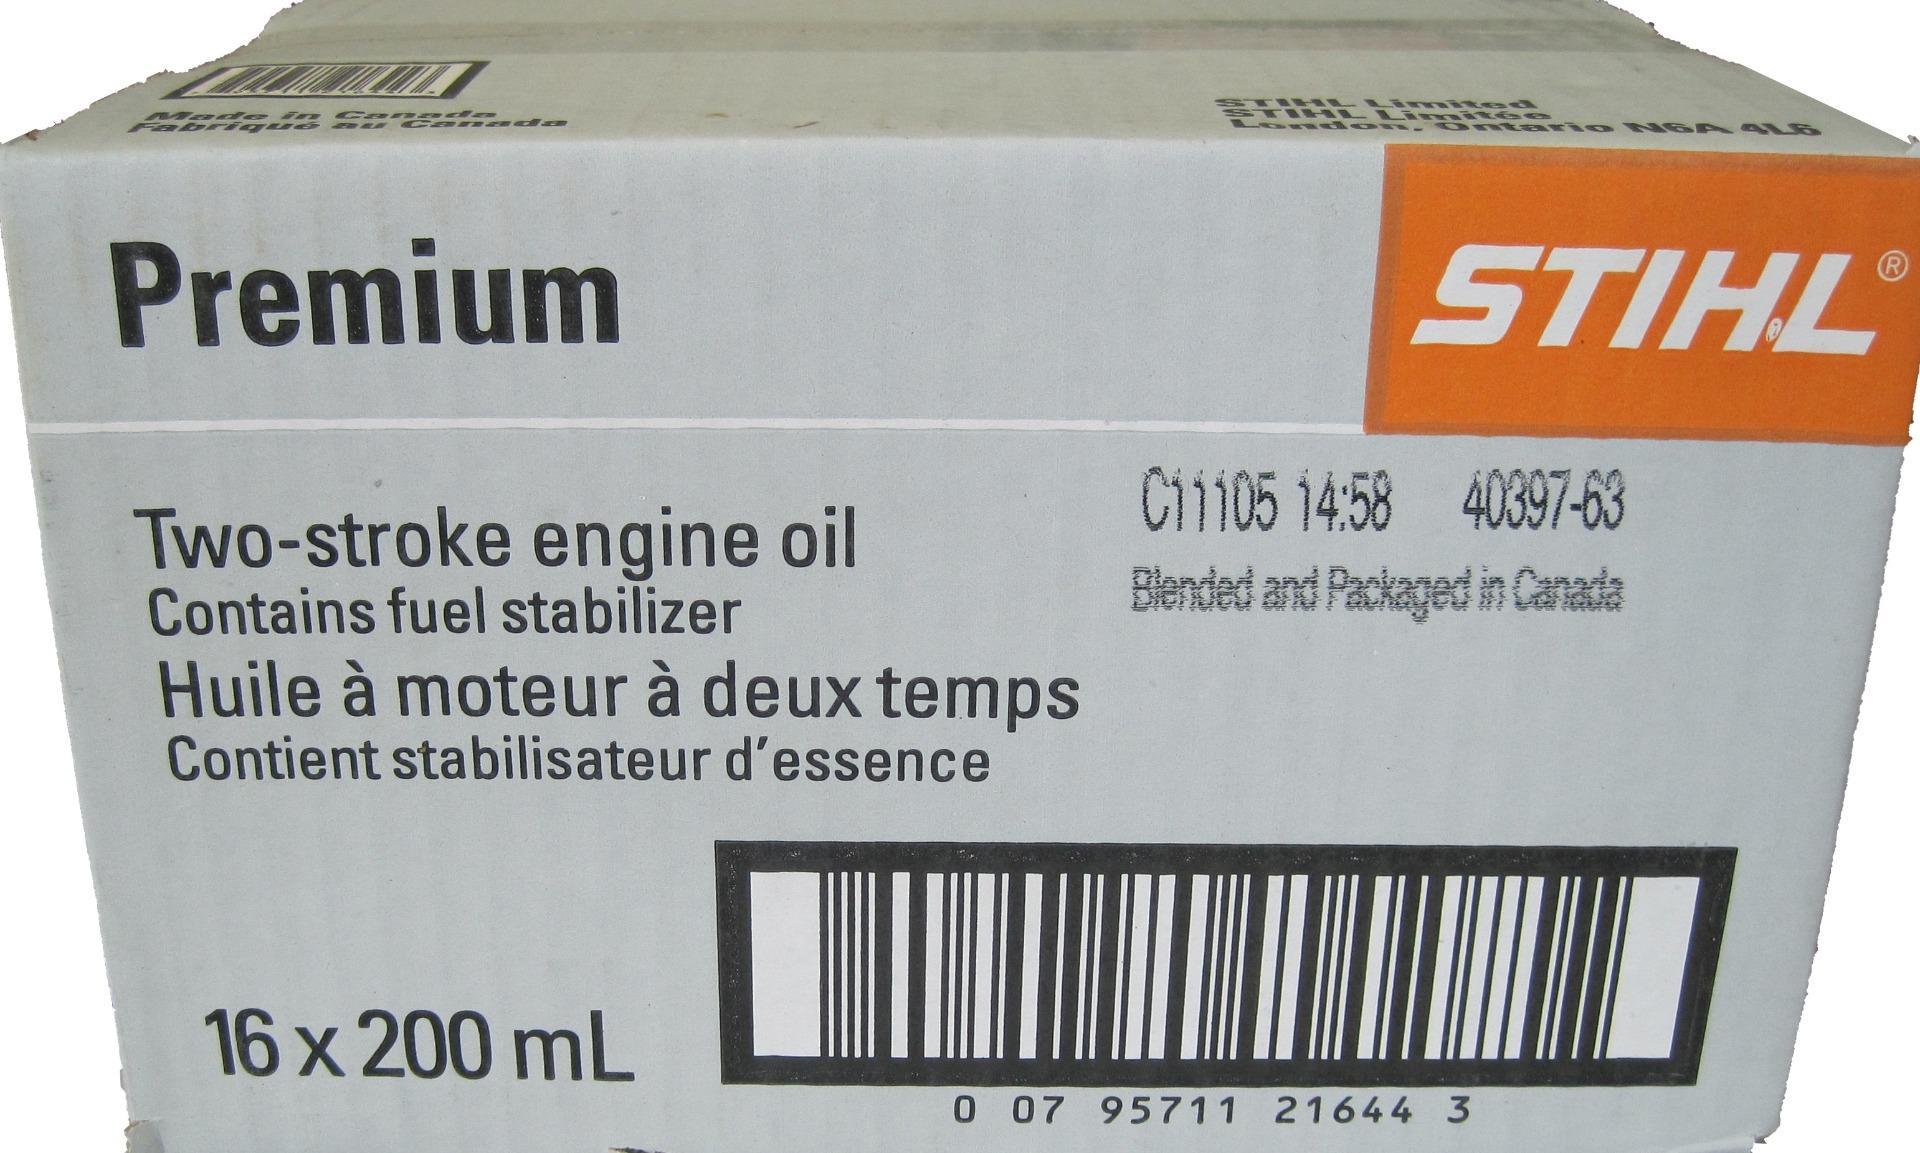 STIHL premium 2 stroke engine oil 16x200mL